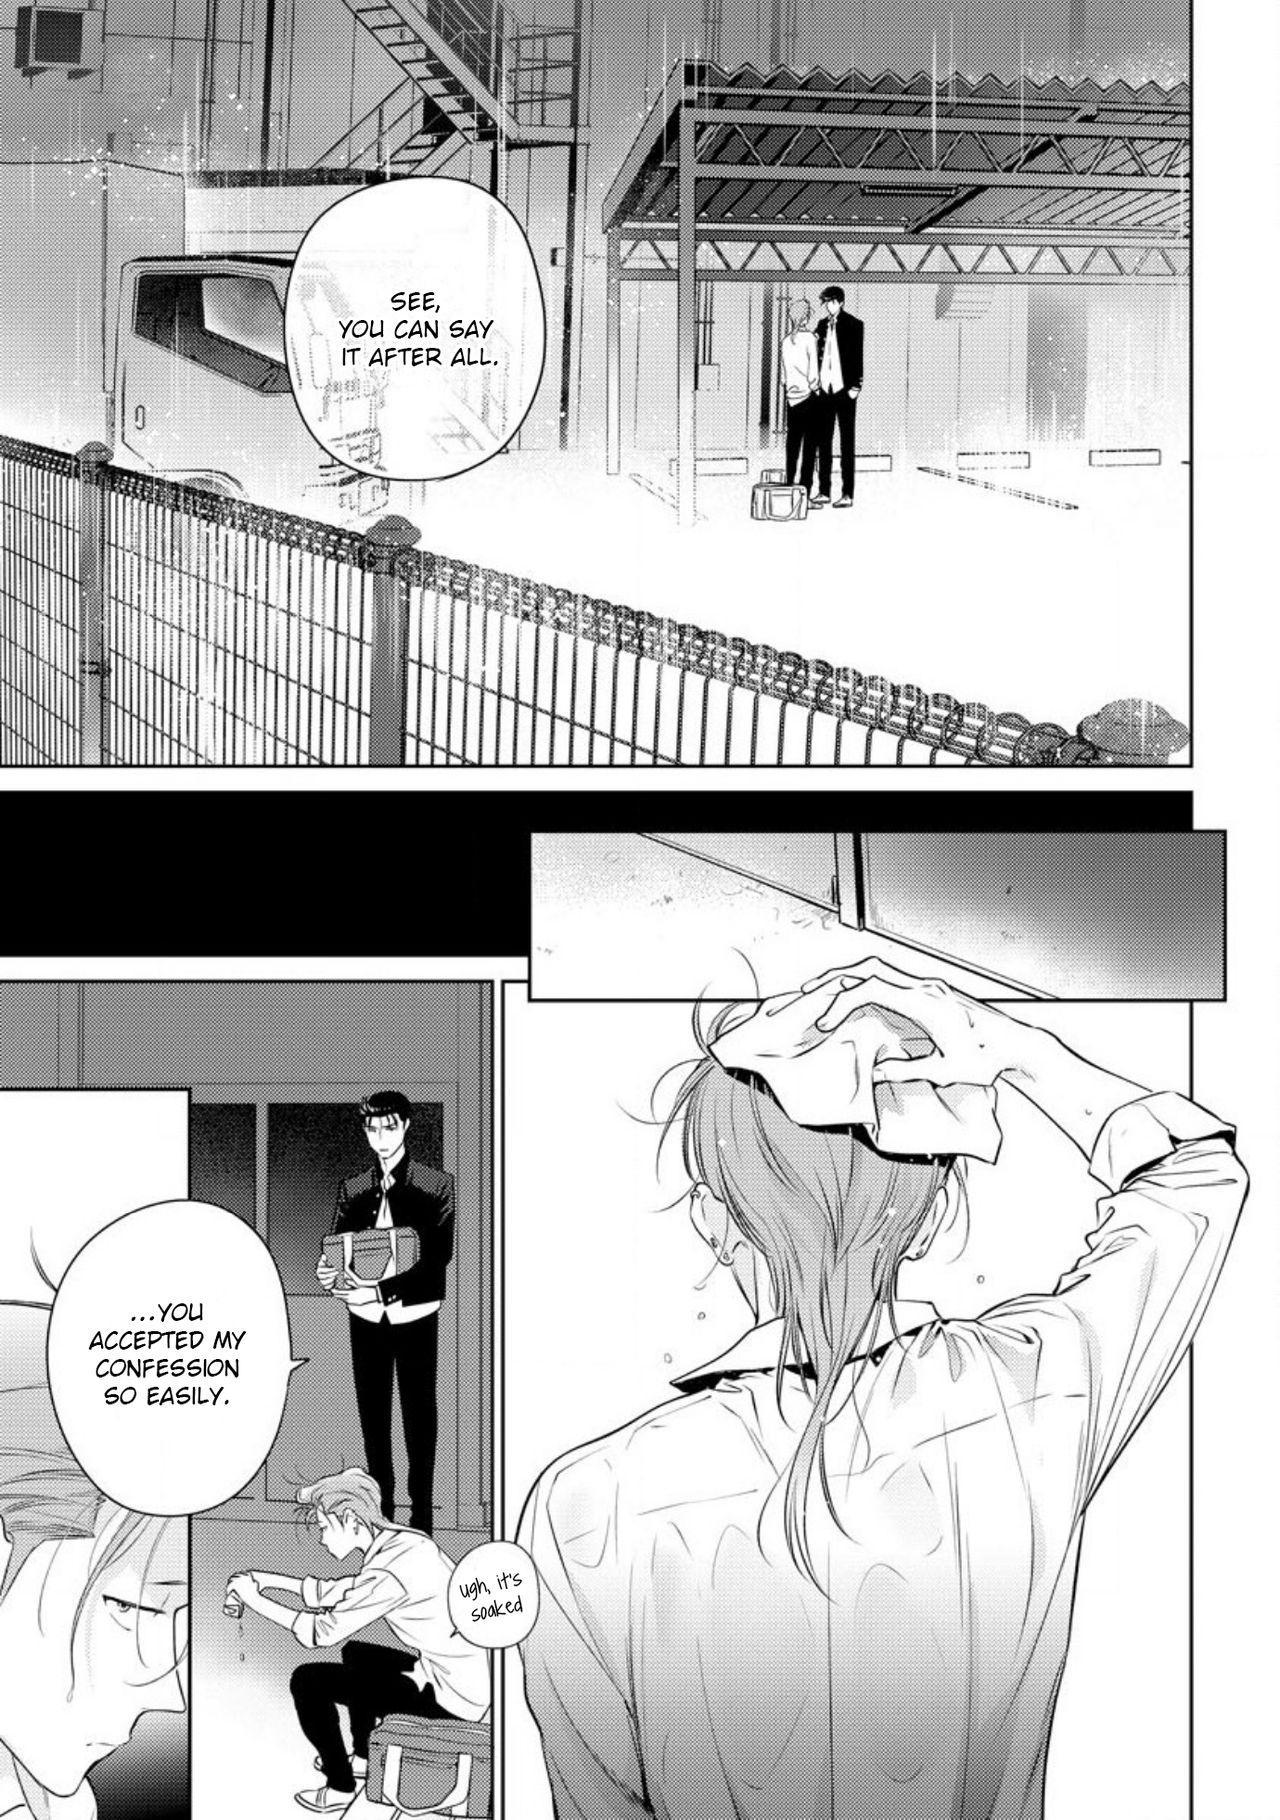 [Hiiragi Nozomu] Nakasete Yaru yo Yankee-kun   I'll Make You Cry Ch. 1-5 + Extras [English] [Digital] 35